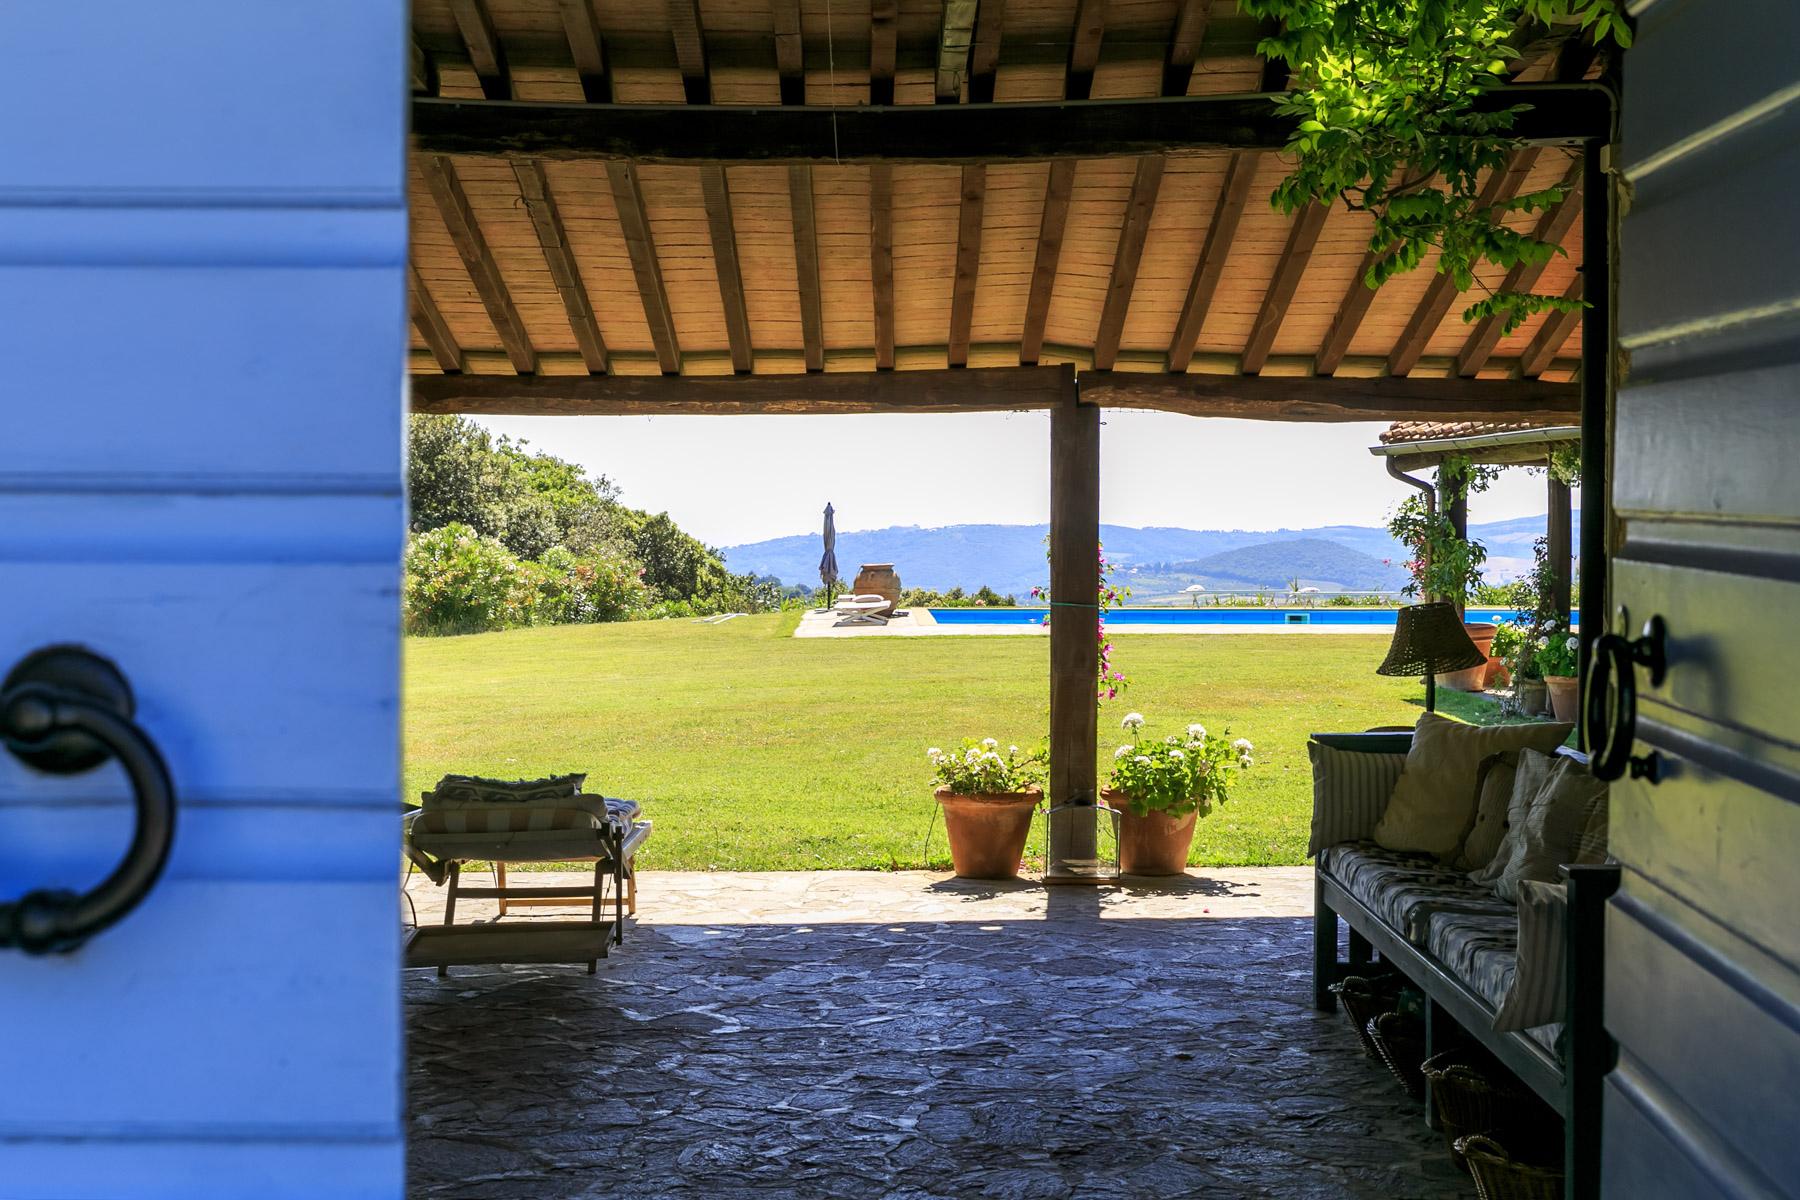 Villa in Vendita a Santa Luce: 5 locali, 270 mq - Foto 20